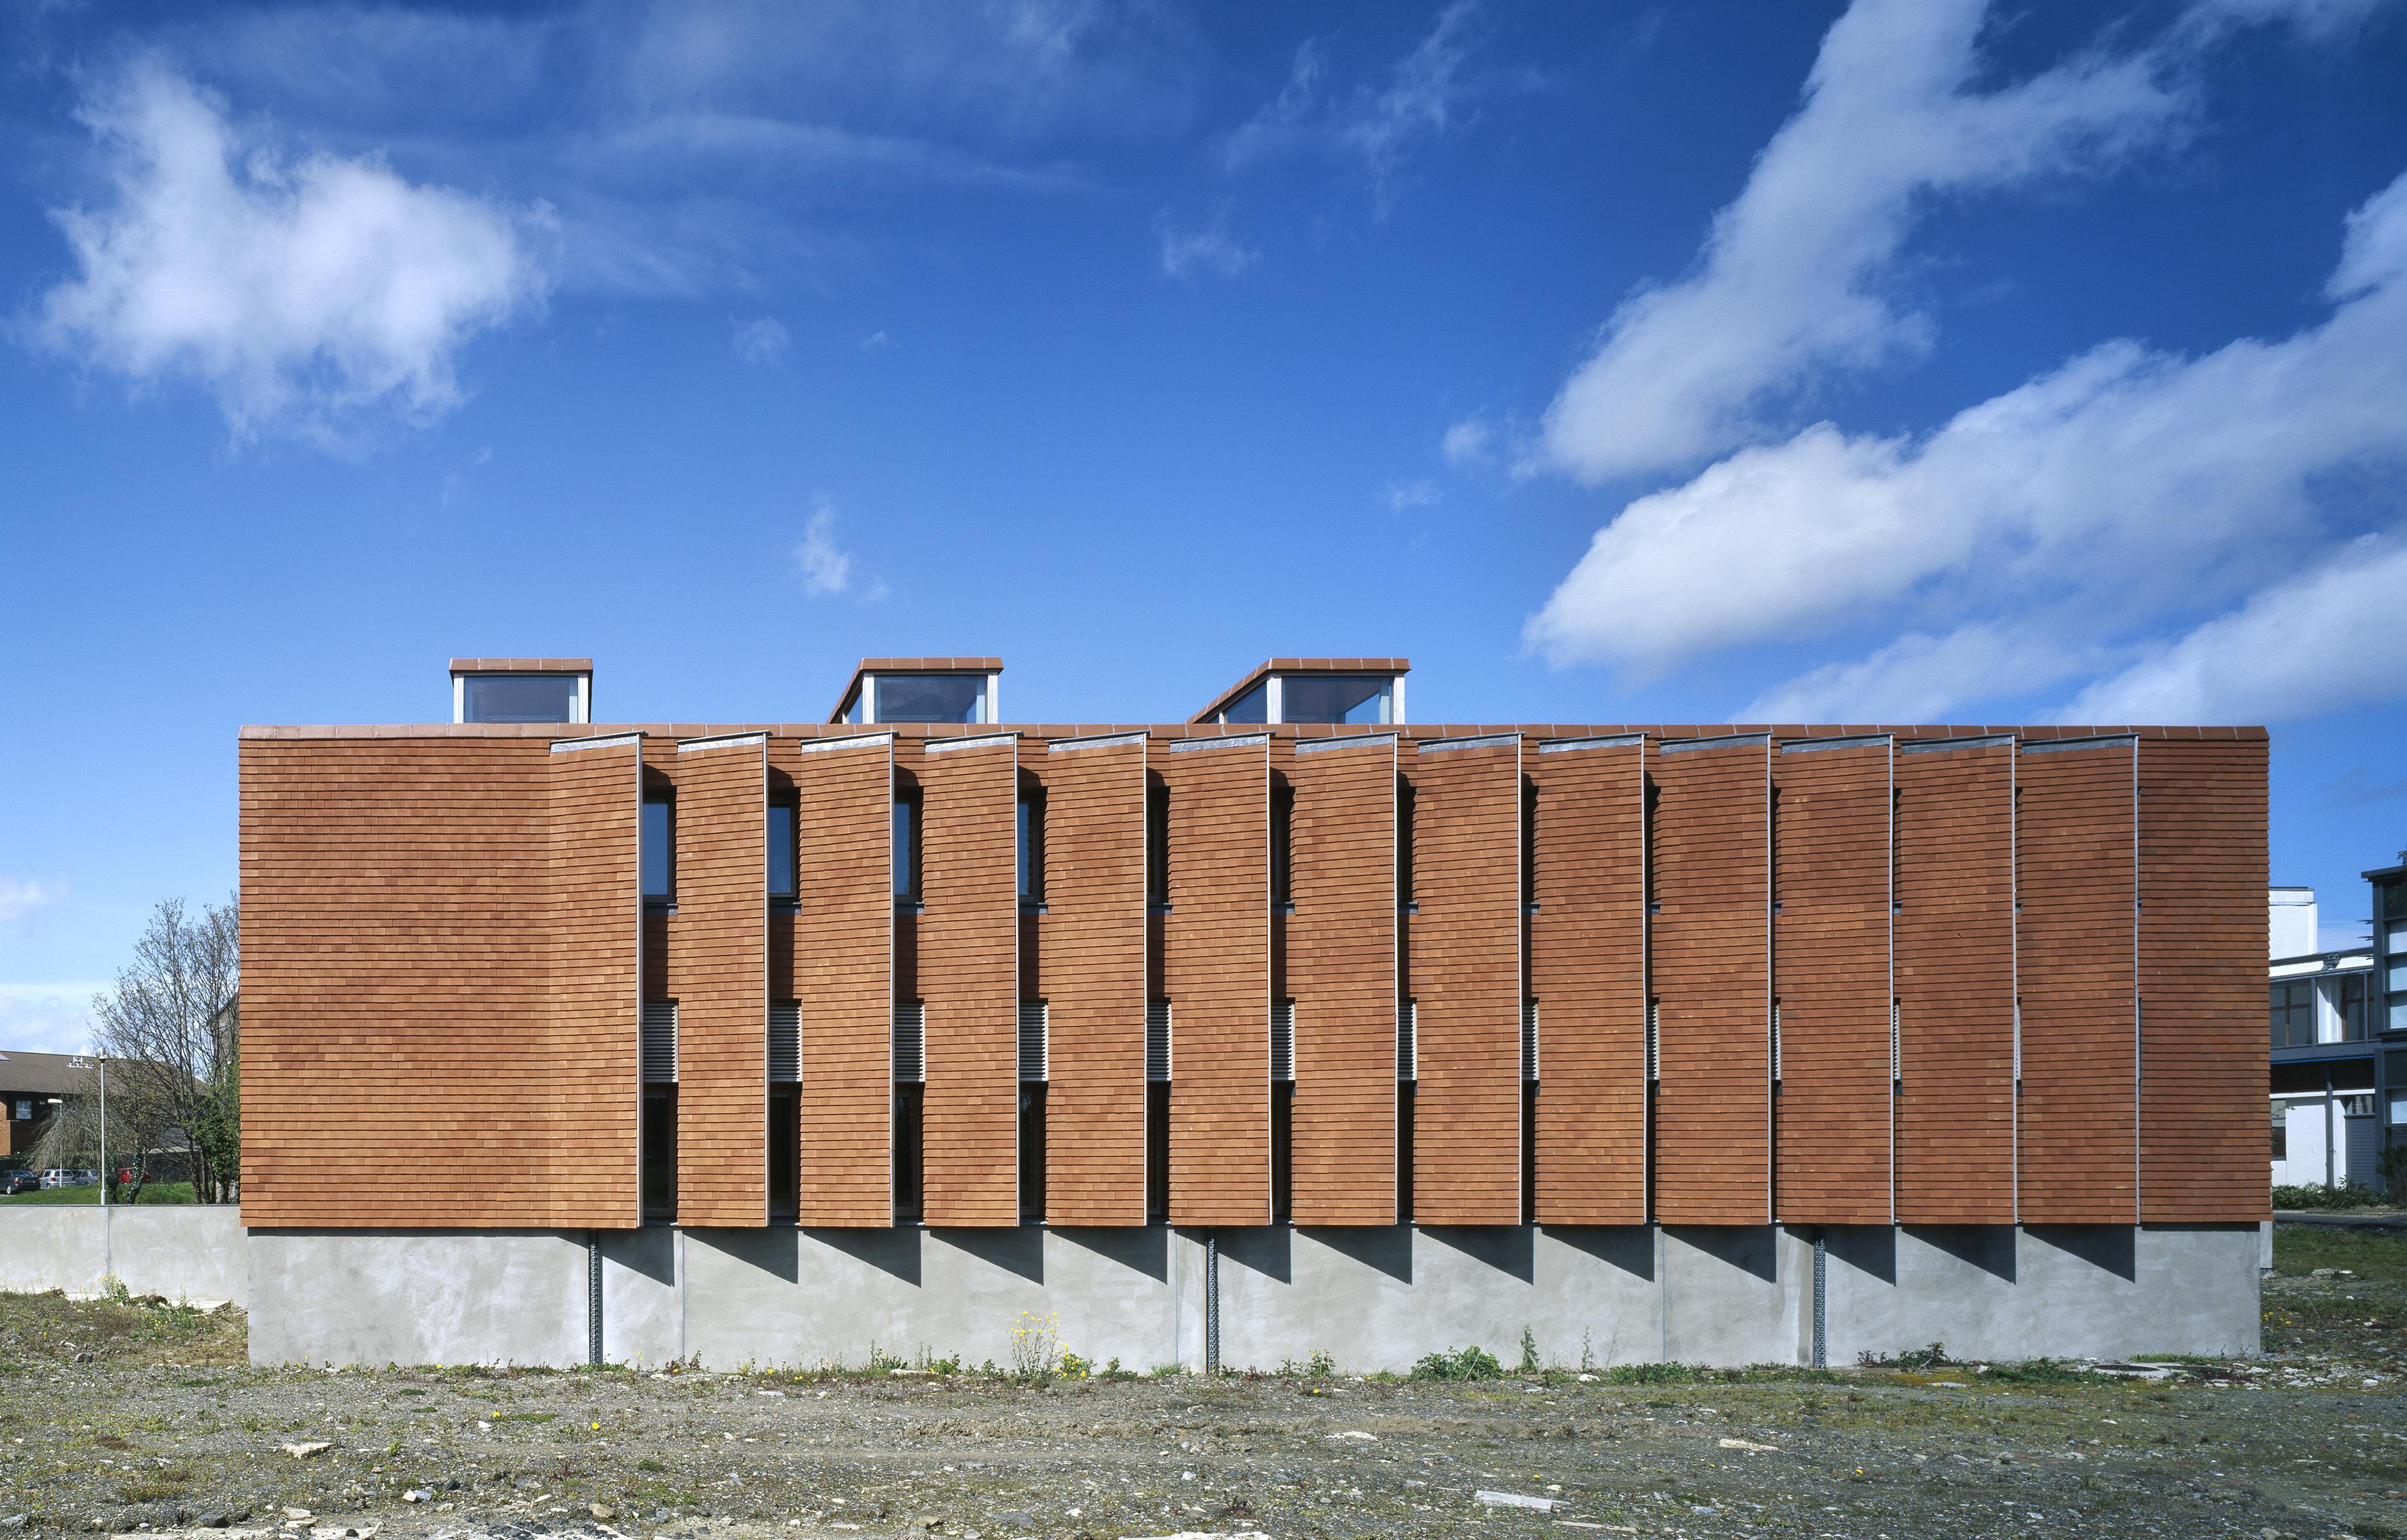 Urban Institute of Ireland / photo courtesy of Ros Kavanagh